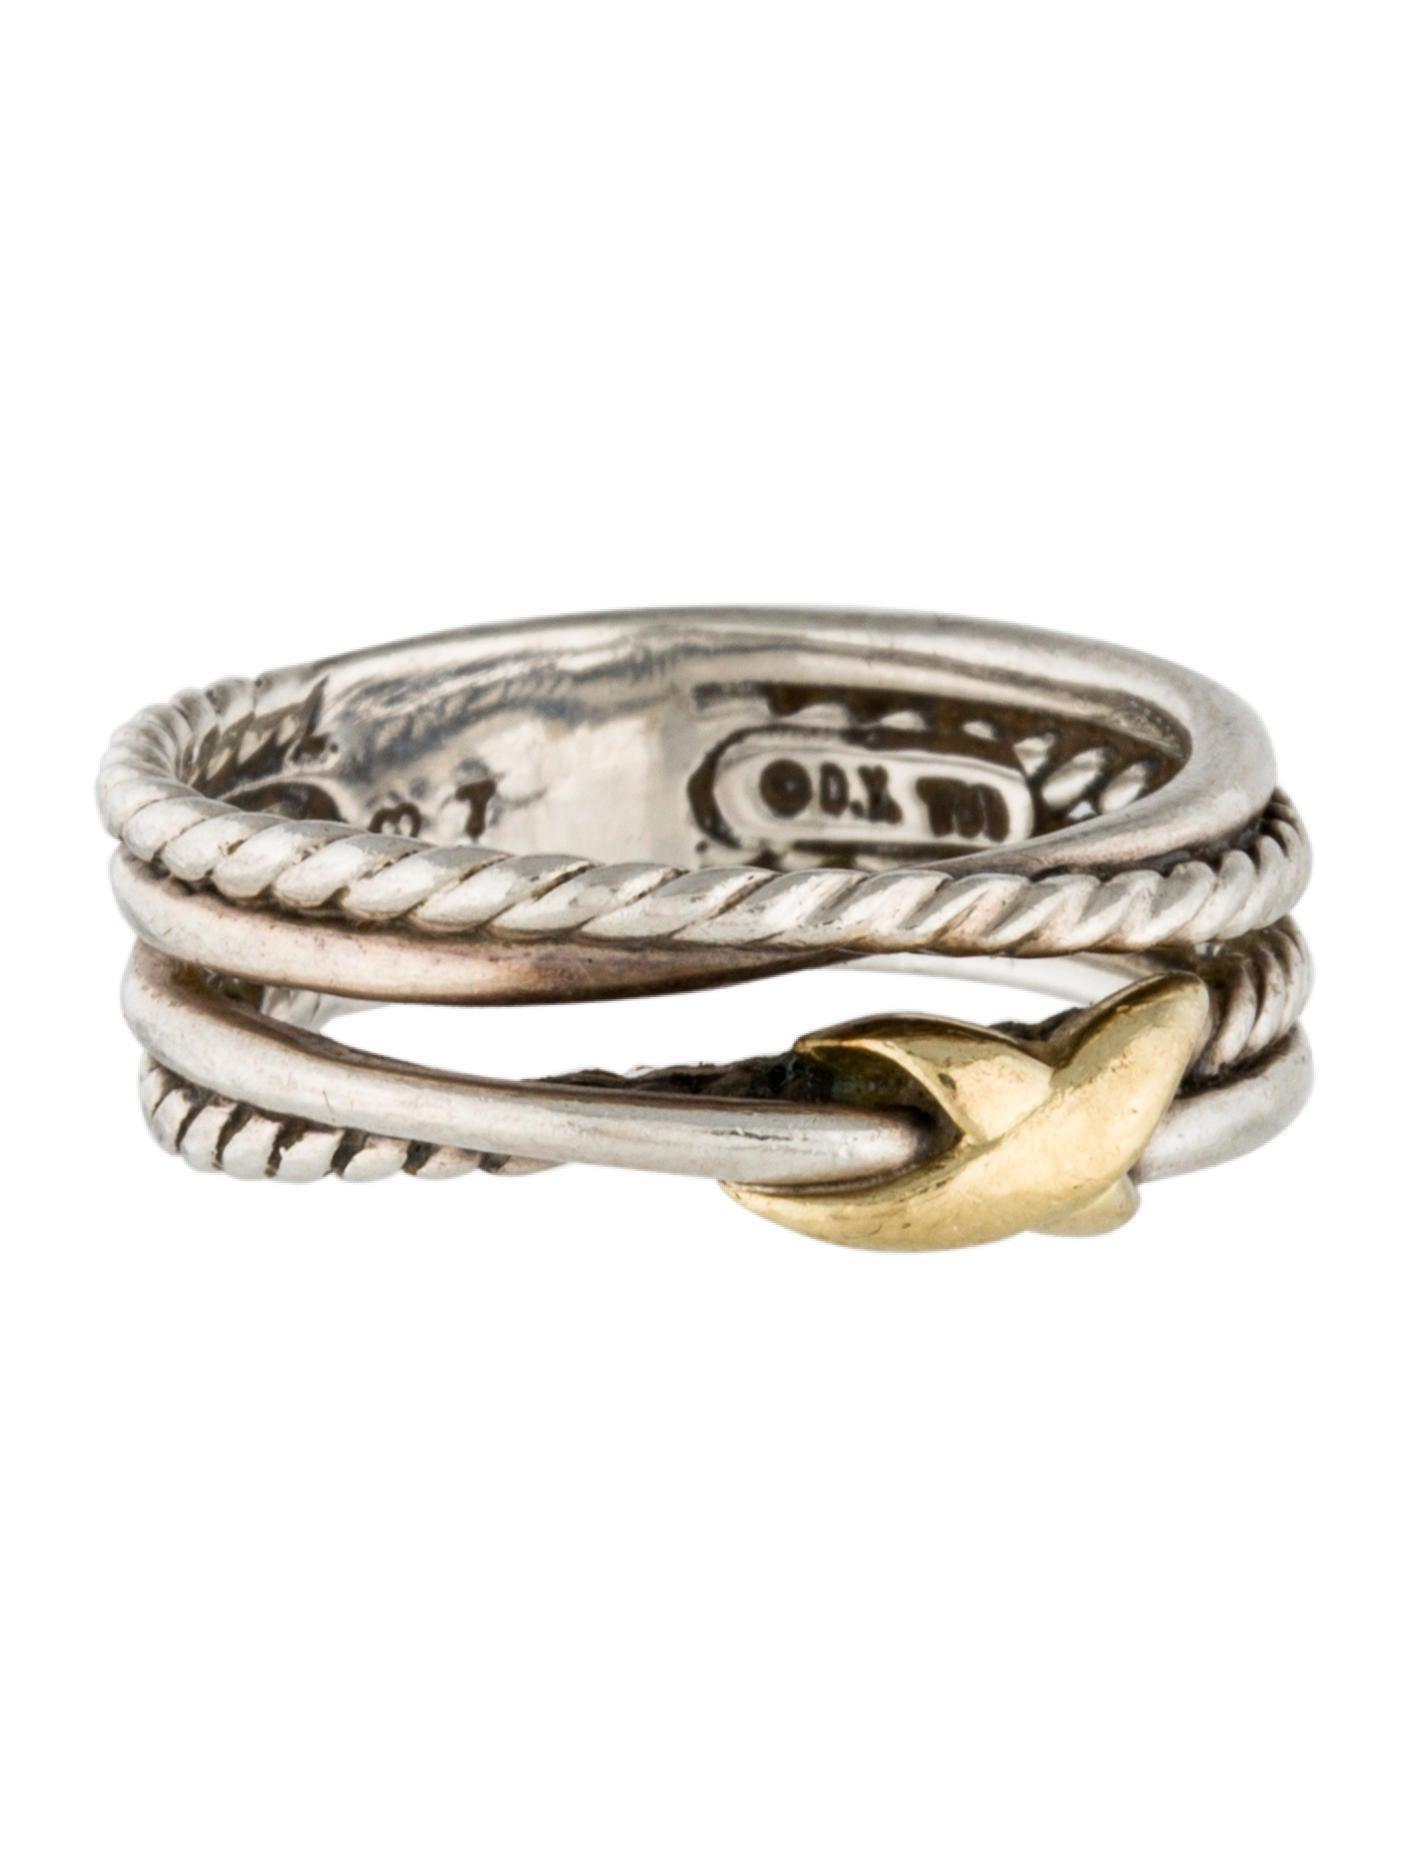 David yurman x crossover ring rings dvy29608 the for David yurman inspired jewelry rings